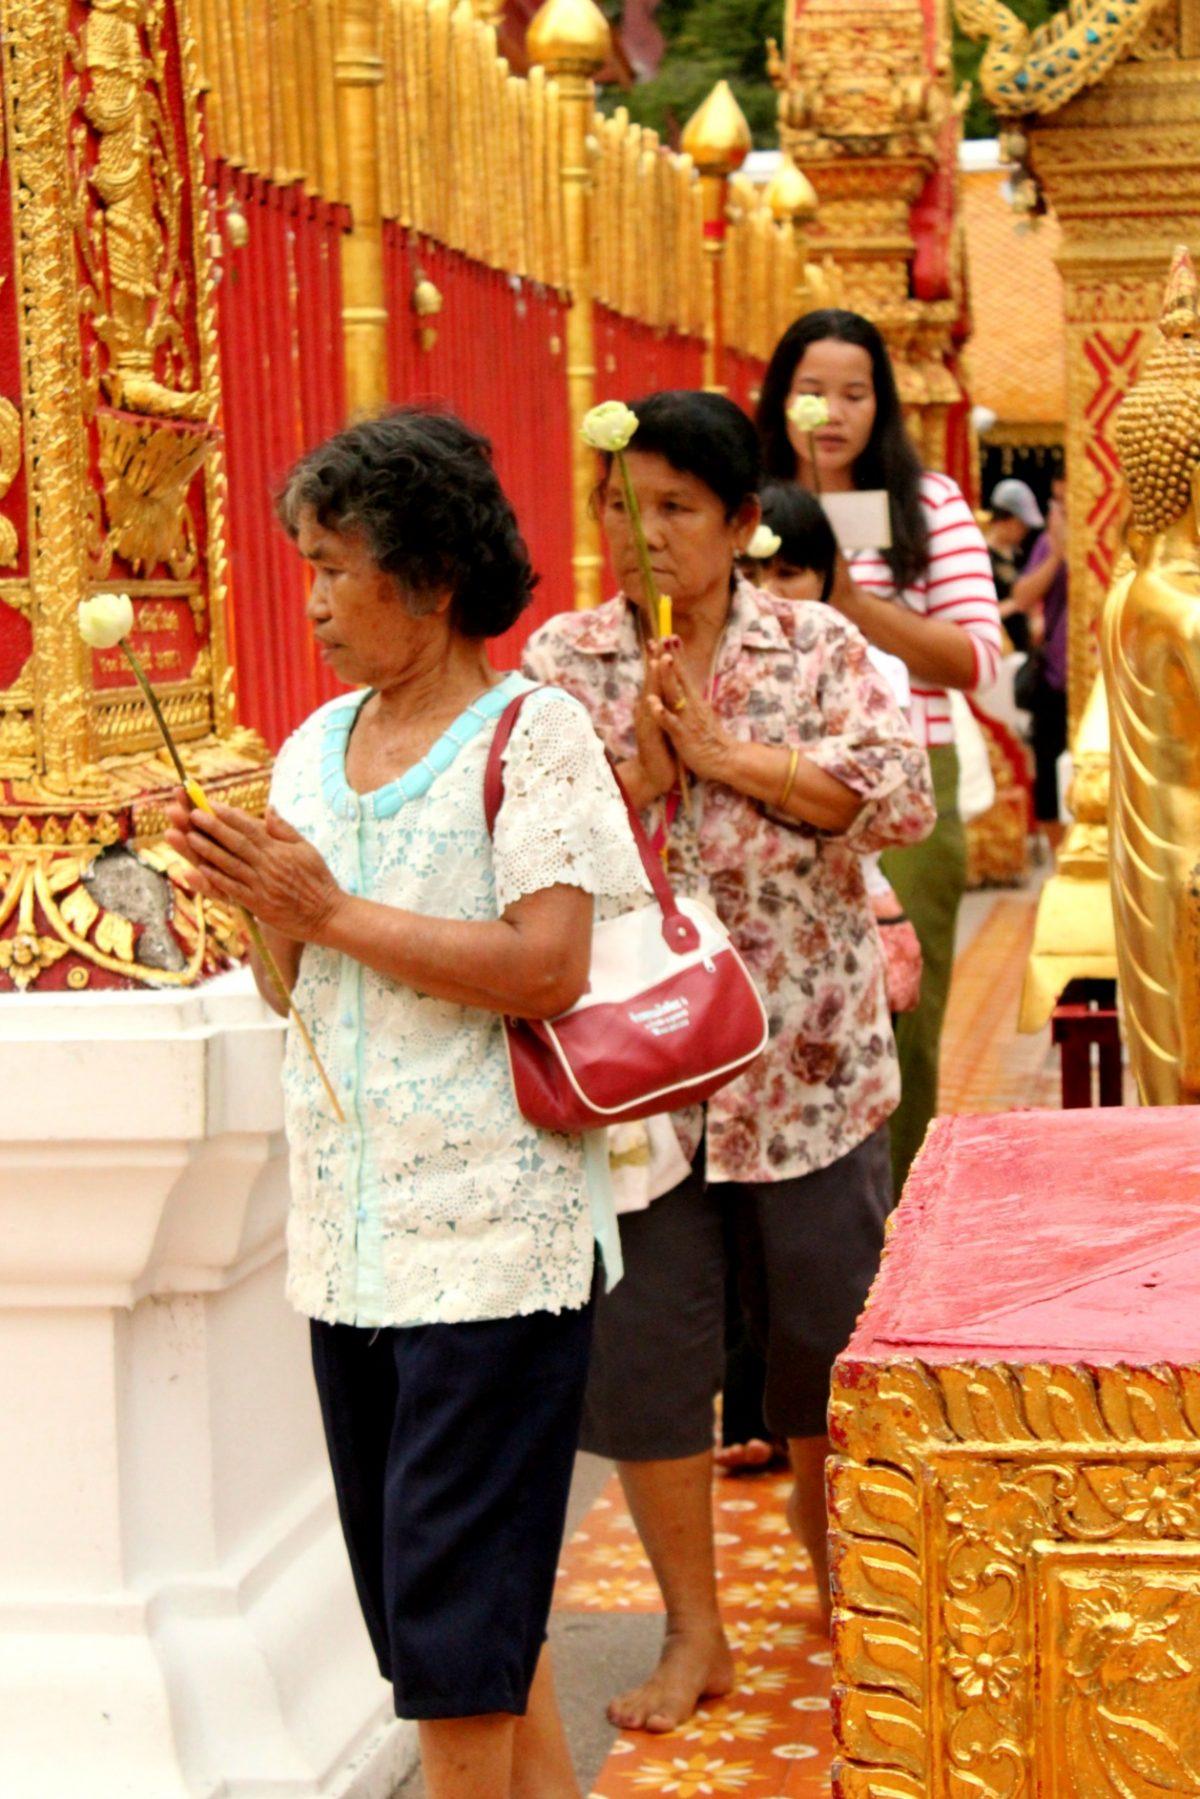 Prayers at Wat Phra That Doi Suthep temple